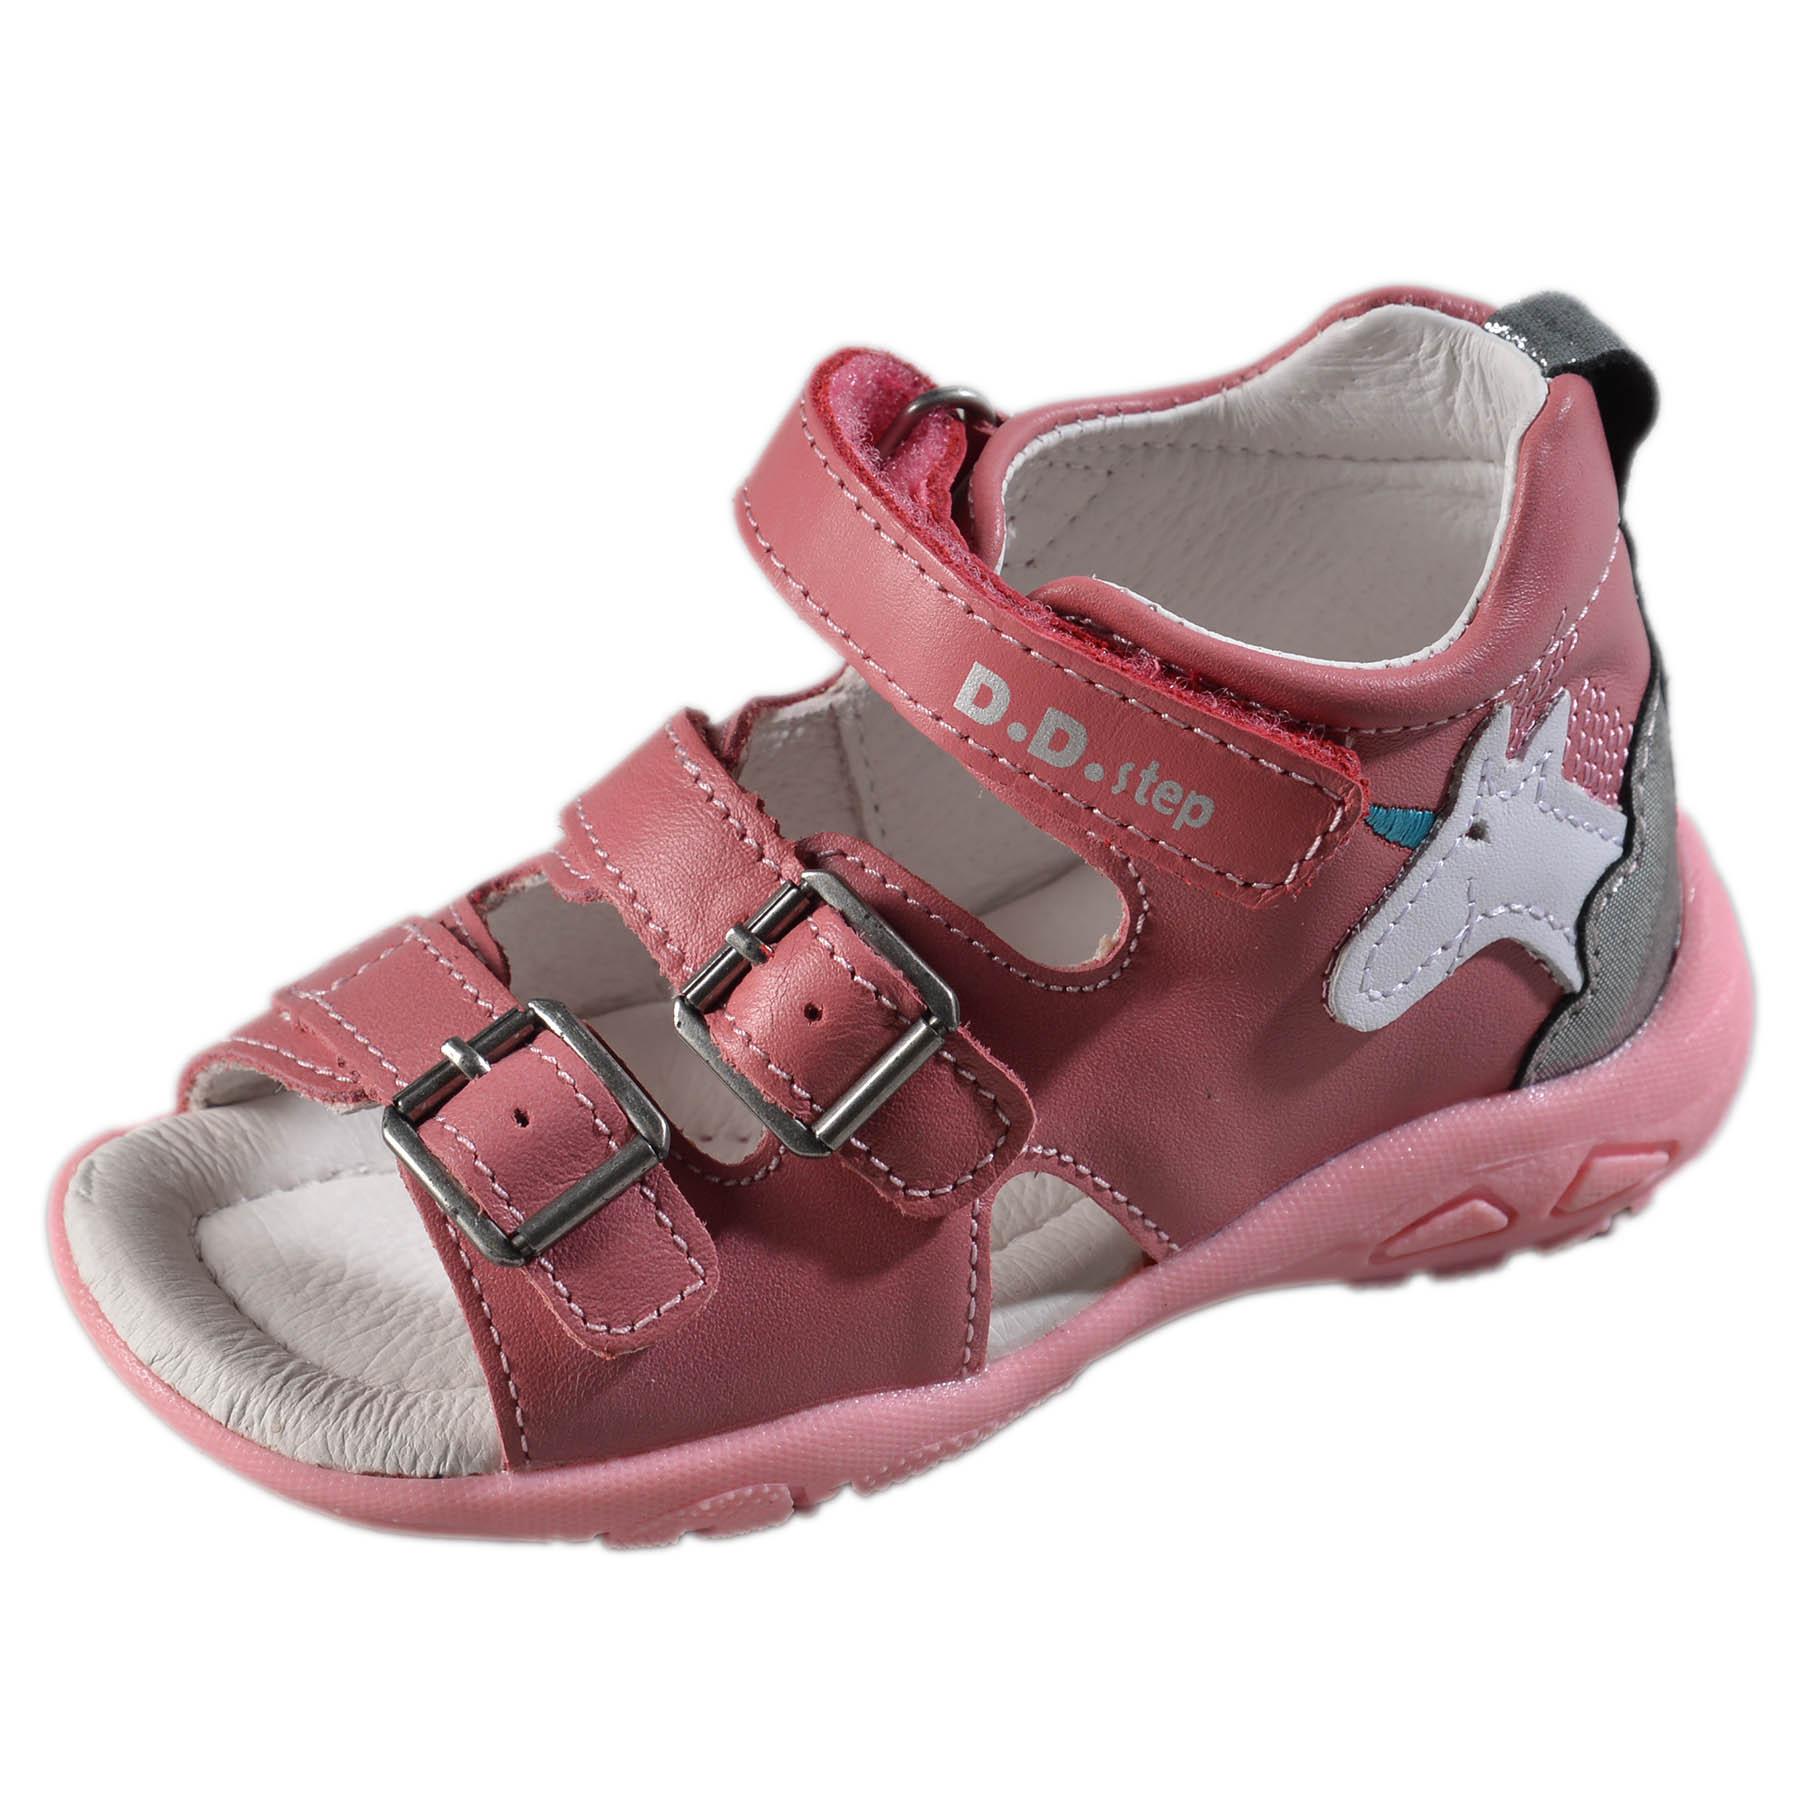 0e5234283d56 Dievčenské kožené sandále-Pink DDstep - AC290-7025C